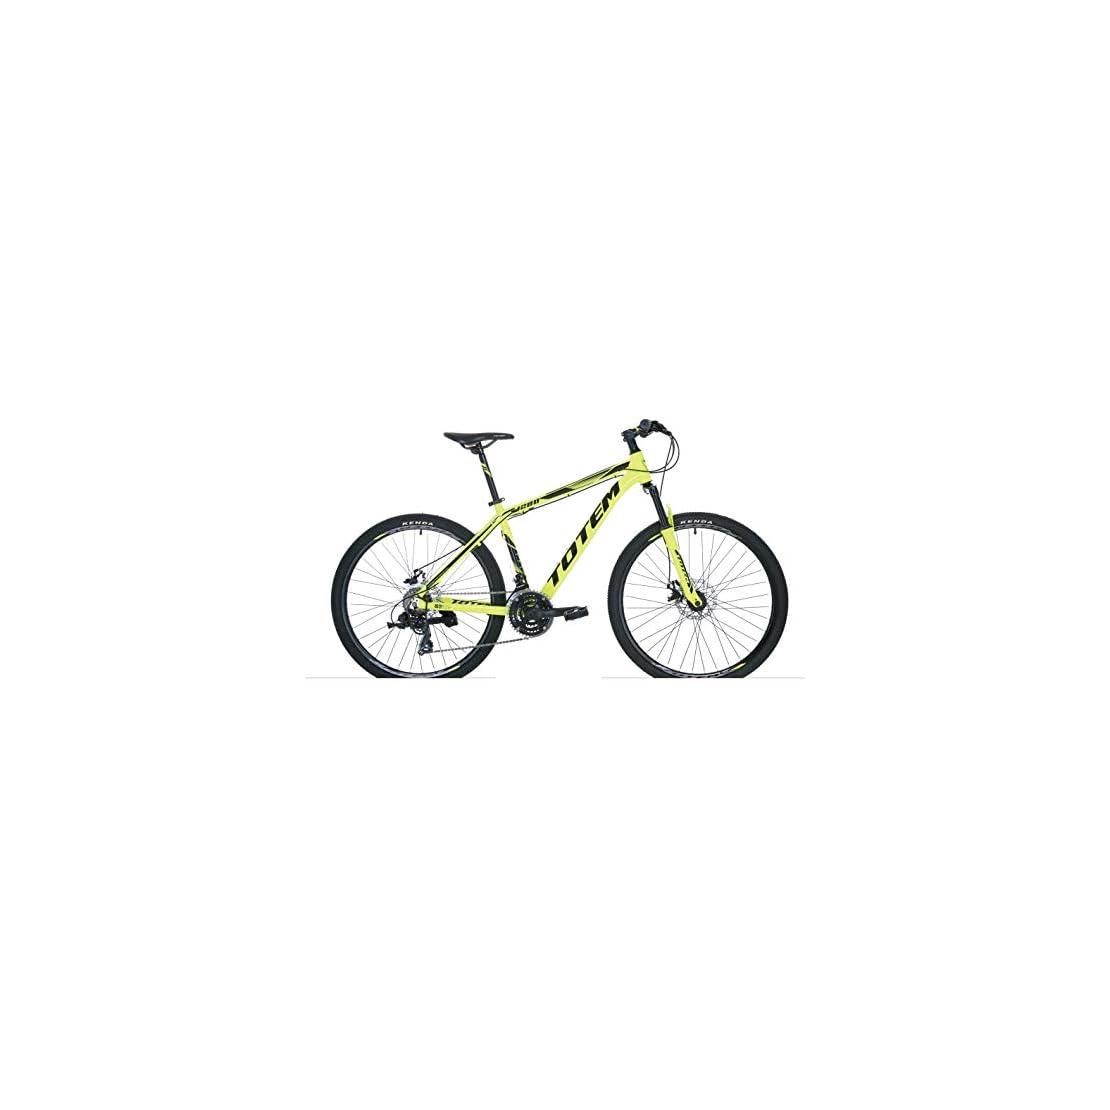 26 Aluminum Frame Mountain Bike Shimano 21 Speed